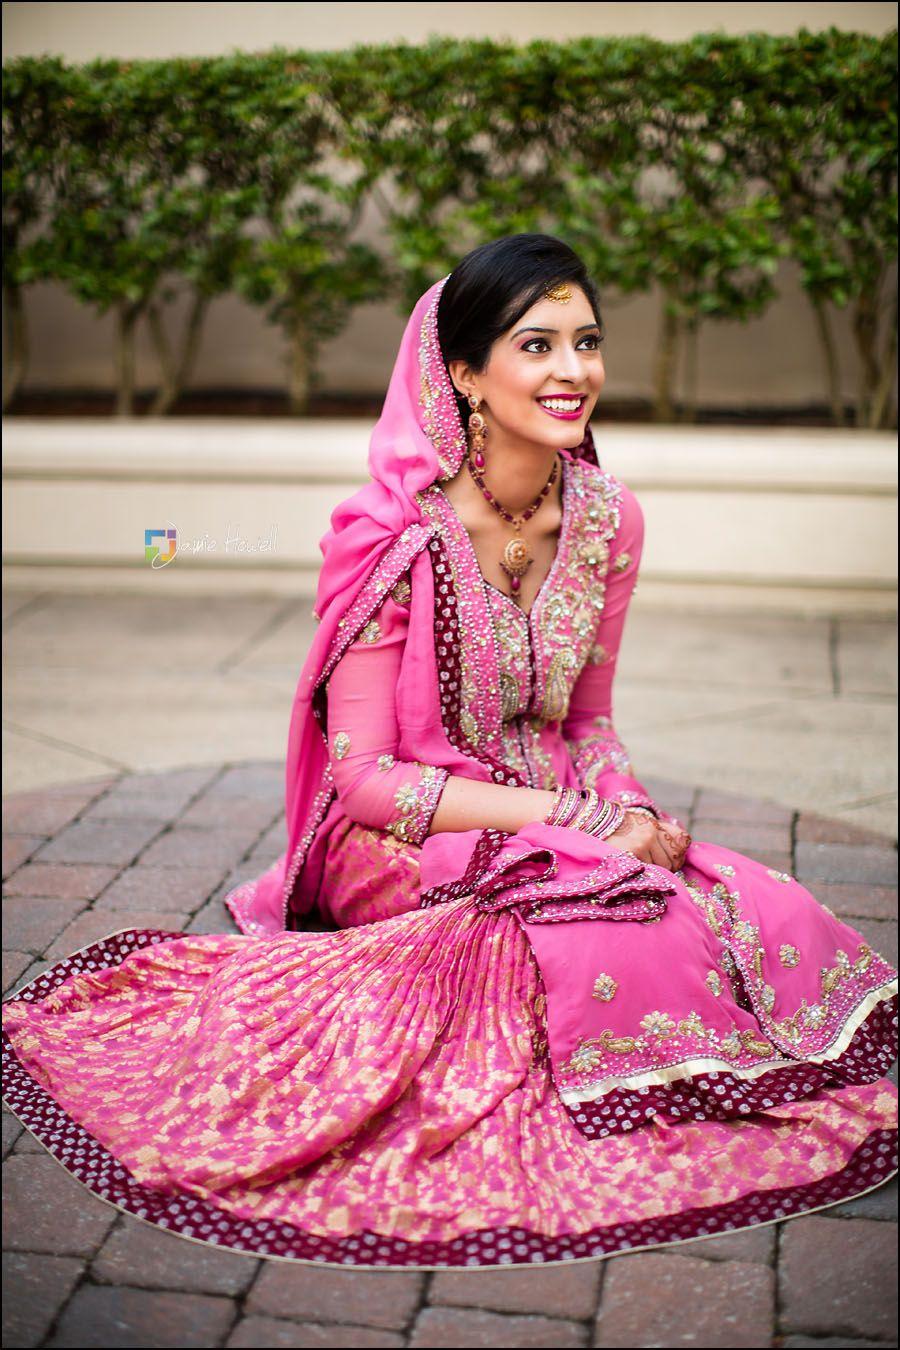 A Pakistani Bride In Long Kameez And Printed Lehenga Looks Beautiful For Her Big Day Muslimbride Pakistanibride Via Jamie Howell Photography